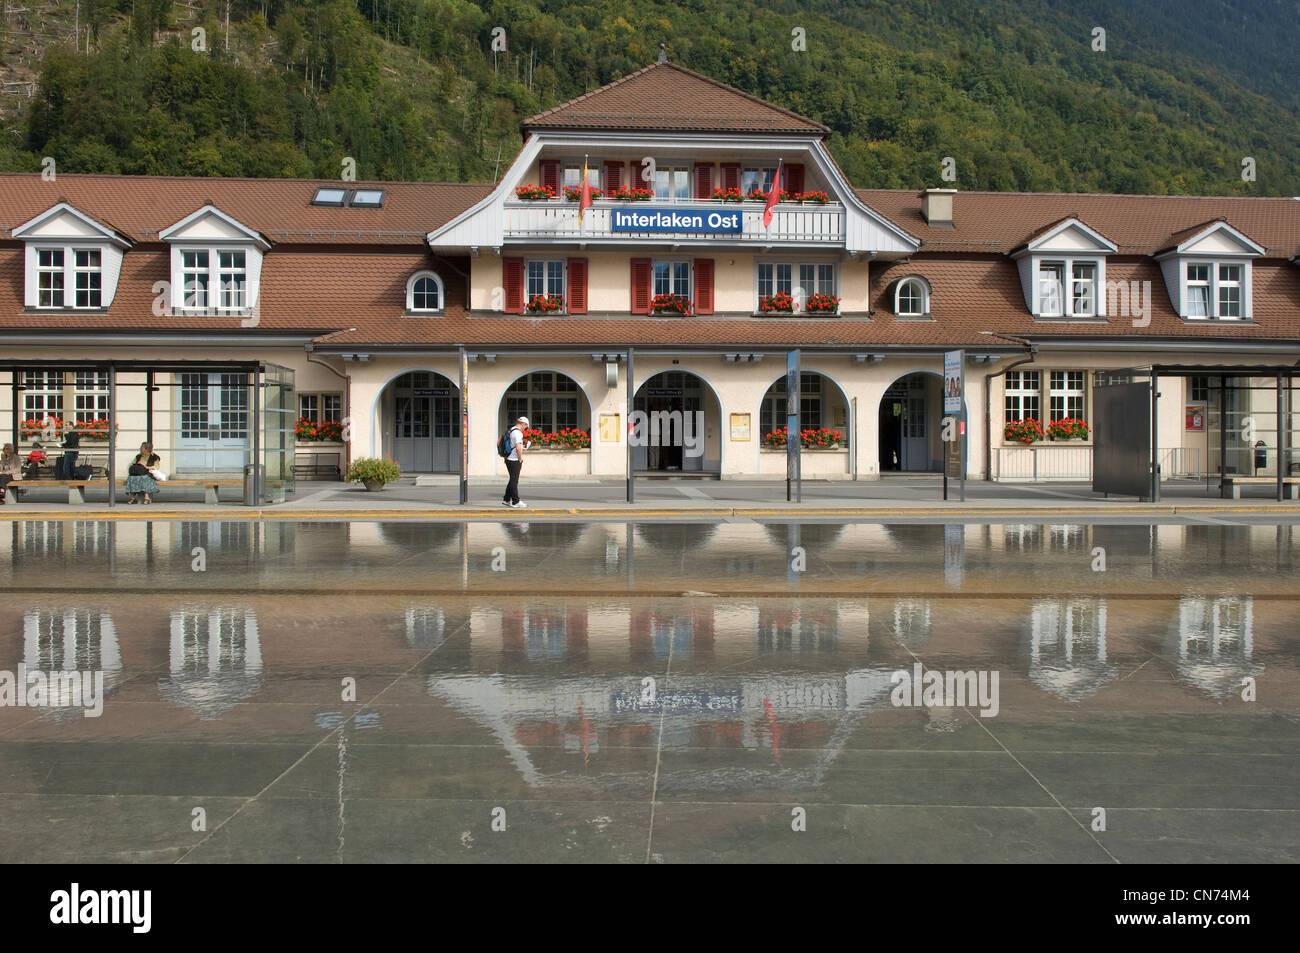 Ost station in Interlaken in the Canton of Bern in Switzerland - Stock Image